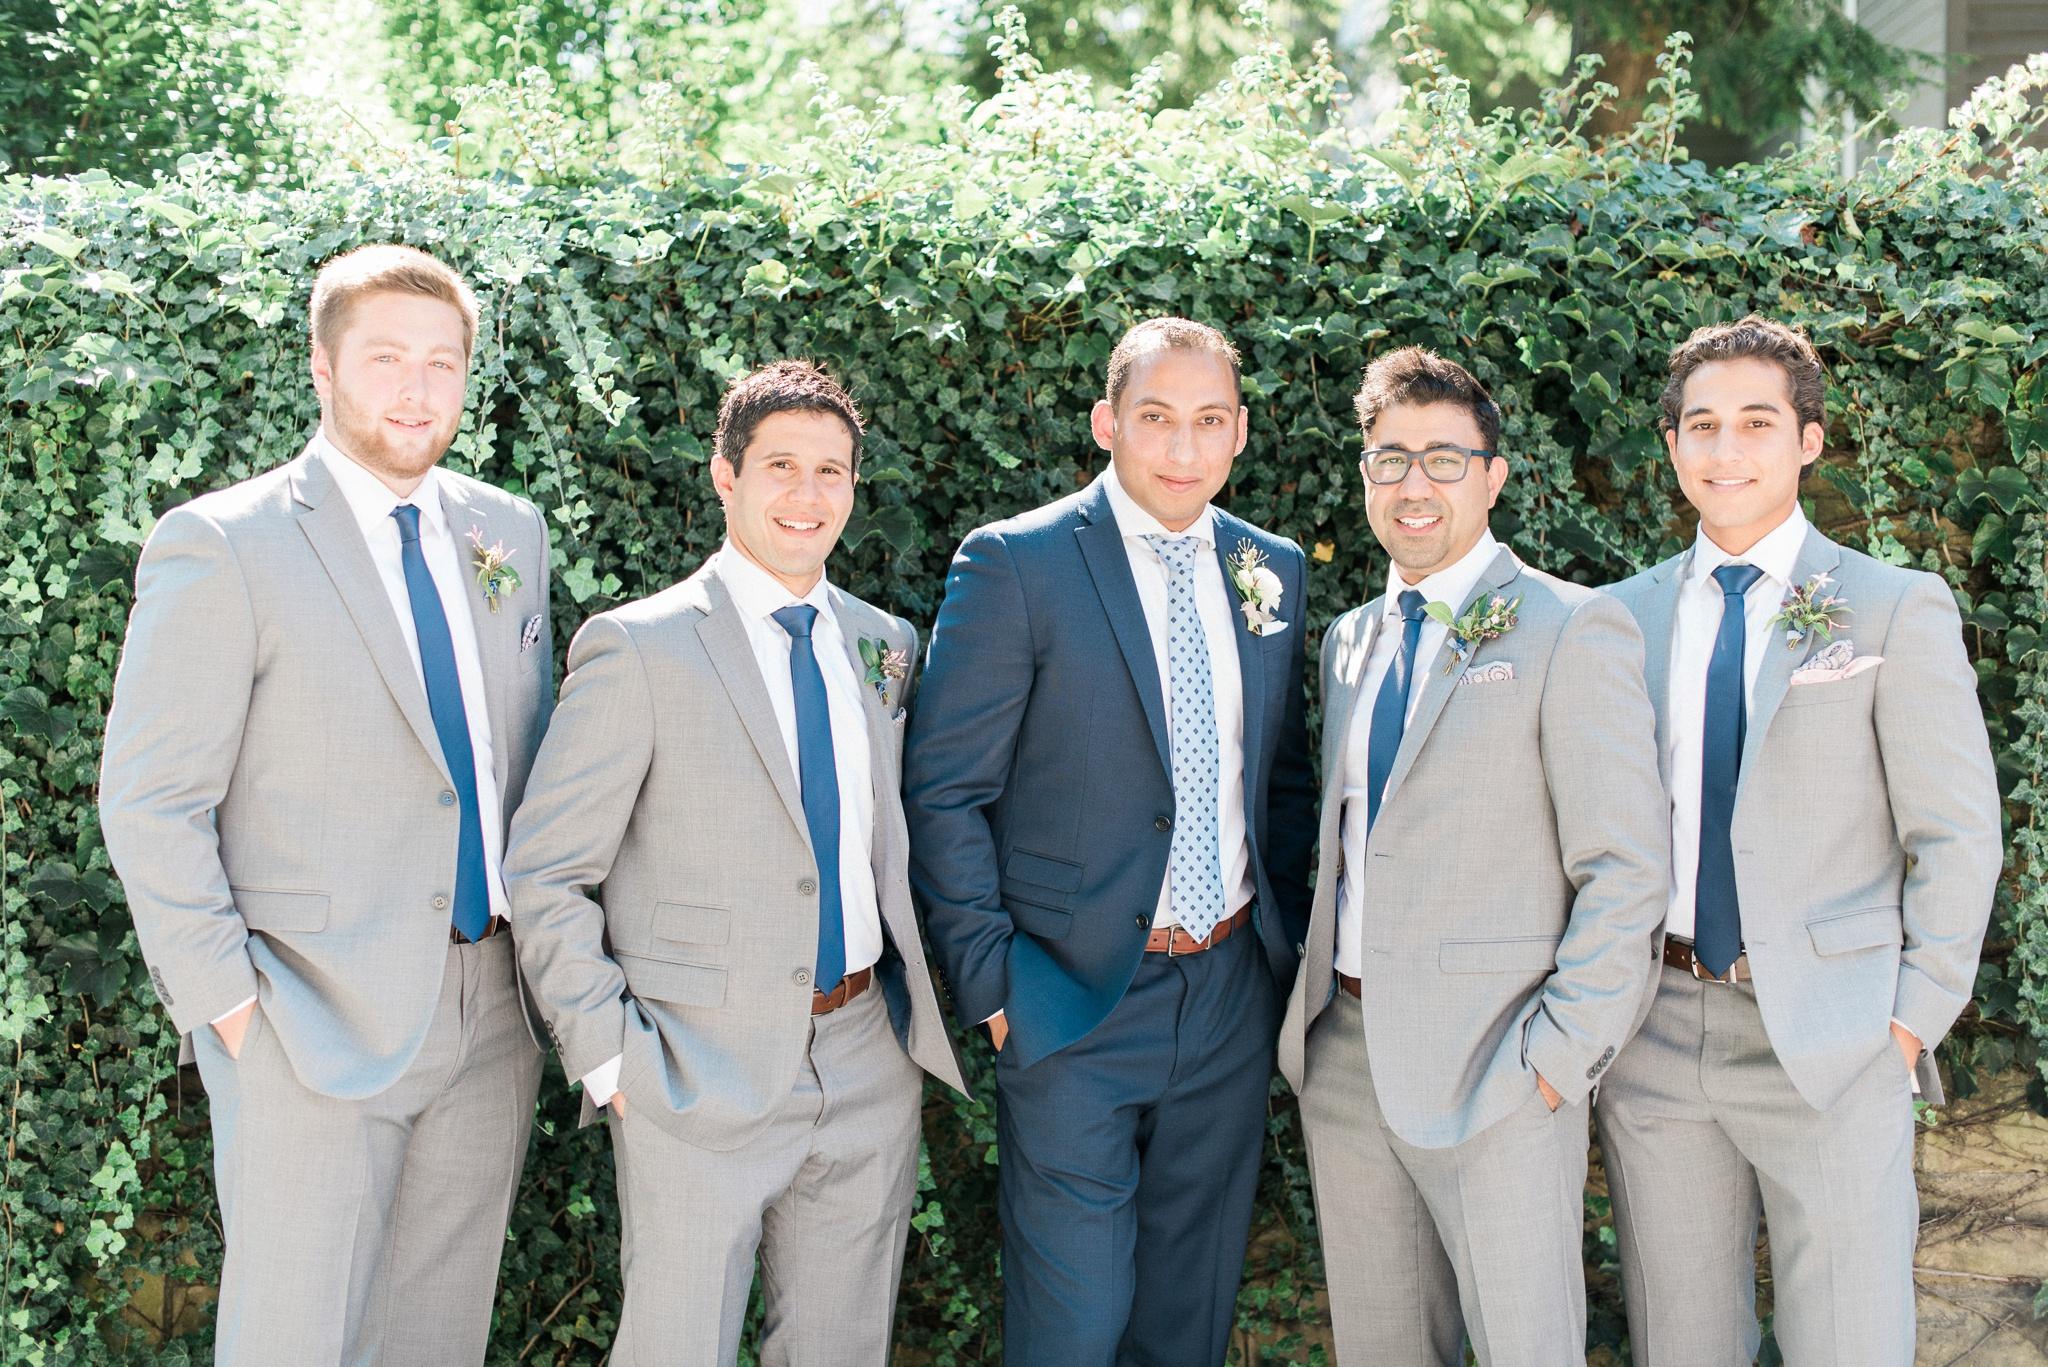 granville-inn-wedding-columbus-ohio-photographer_0029.jpg